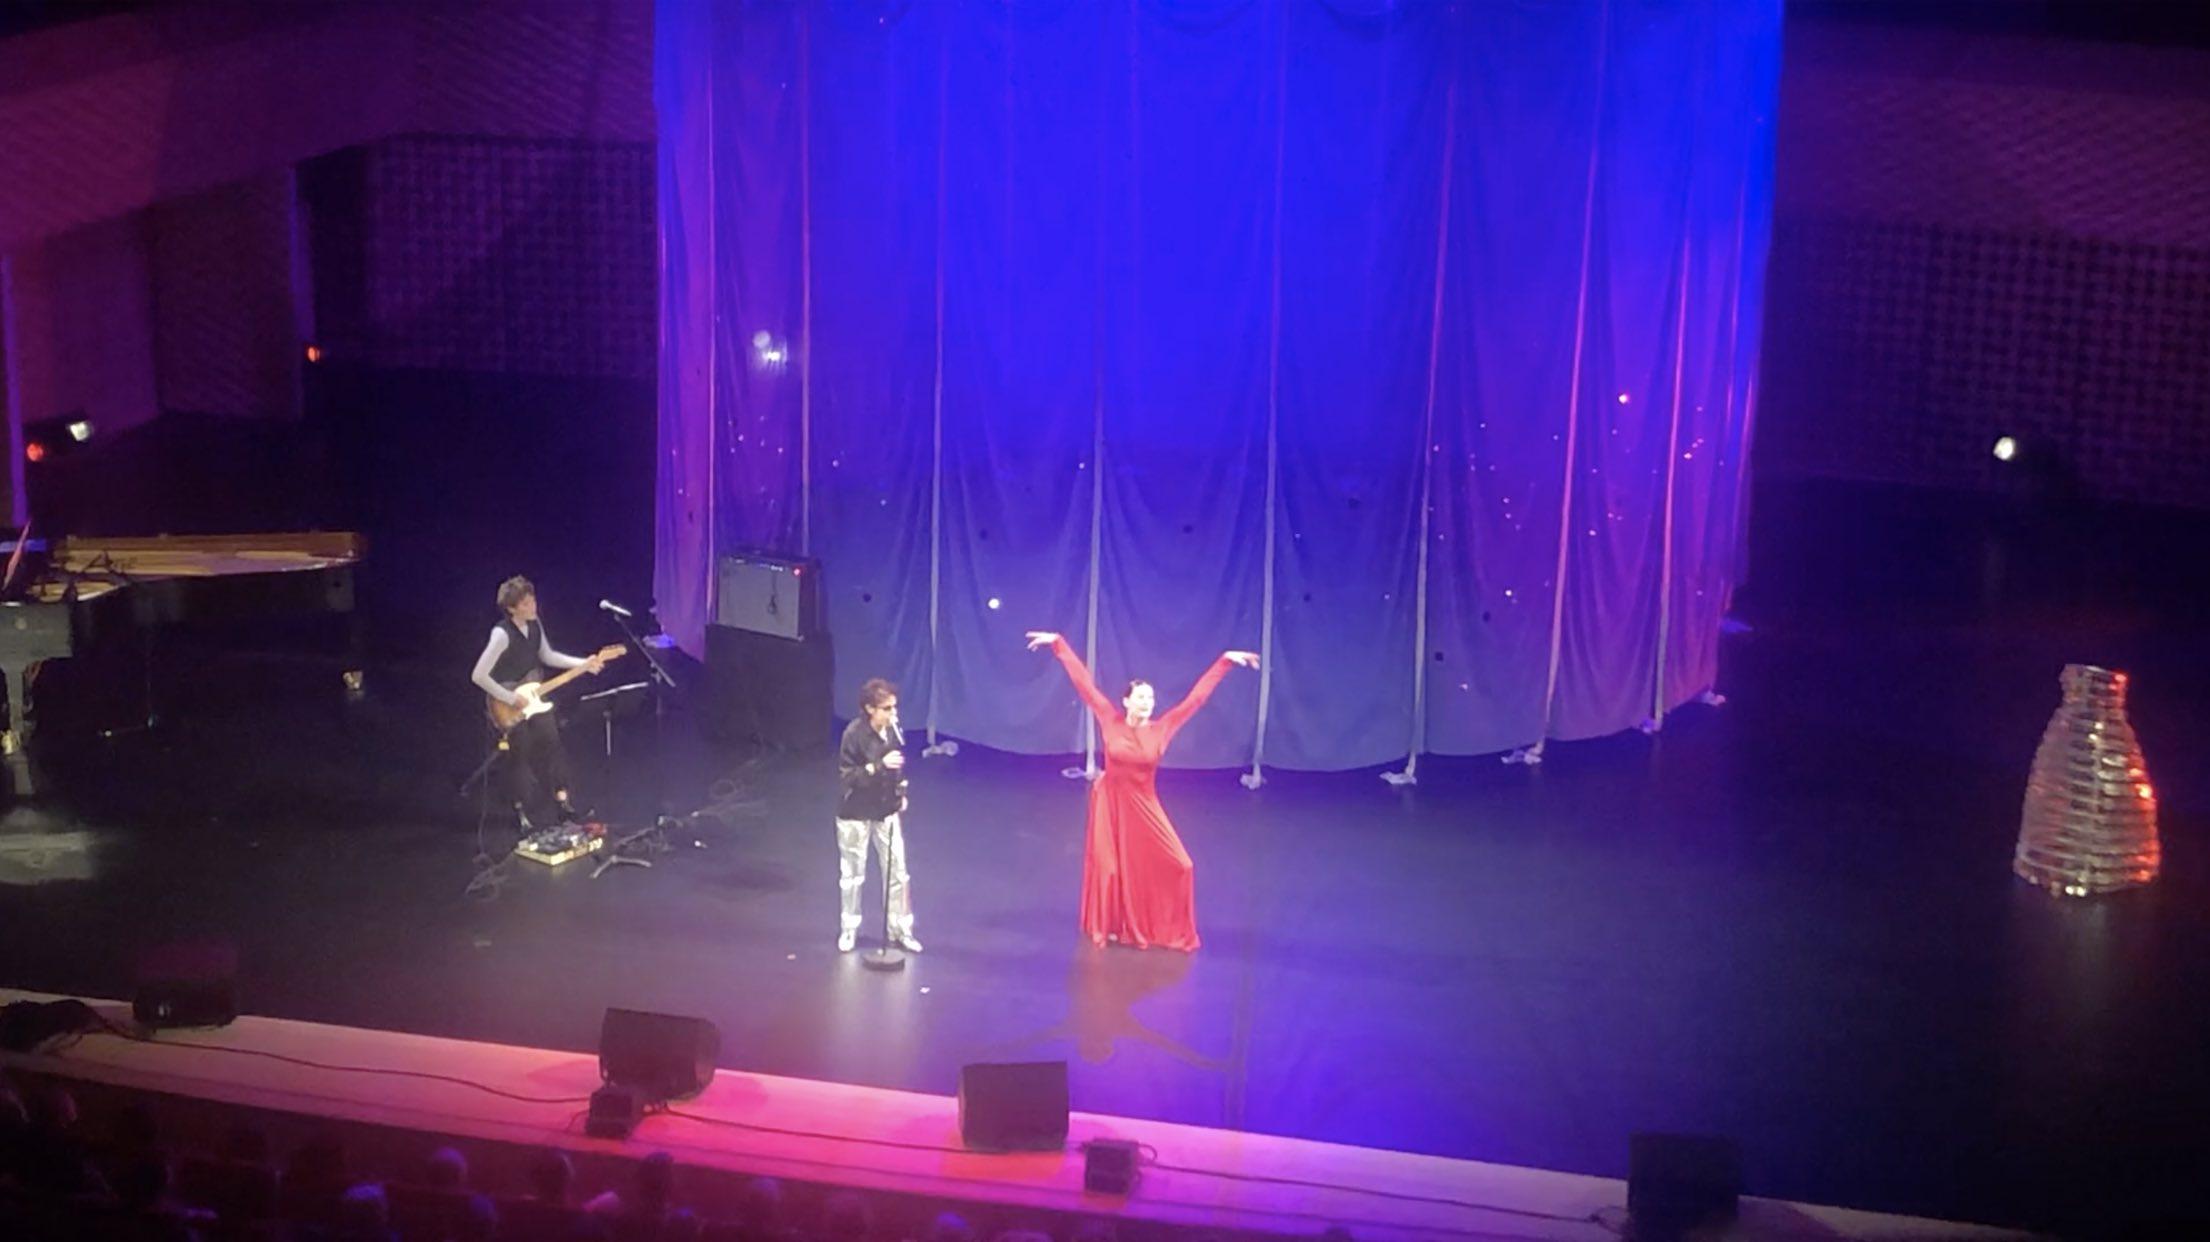 Dani - Marie Agnès Gillot - Seine musicale - danse la chante là